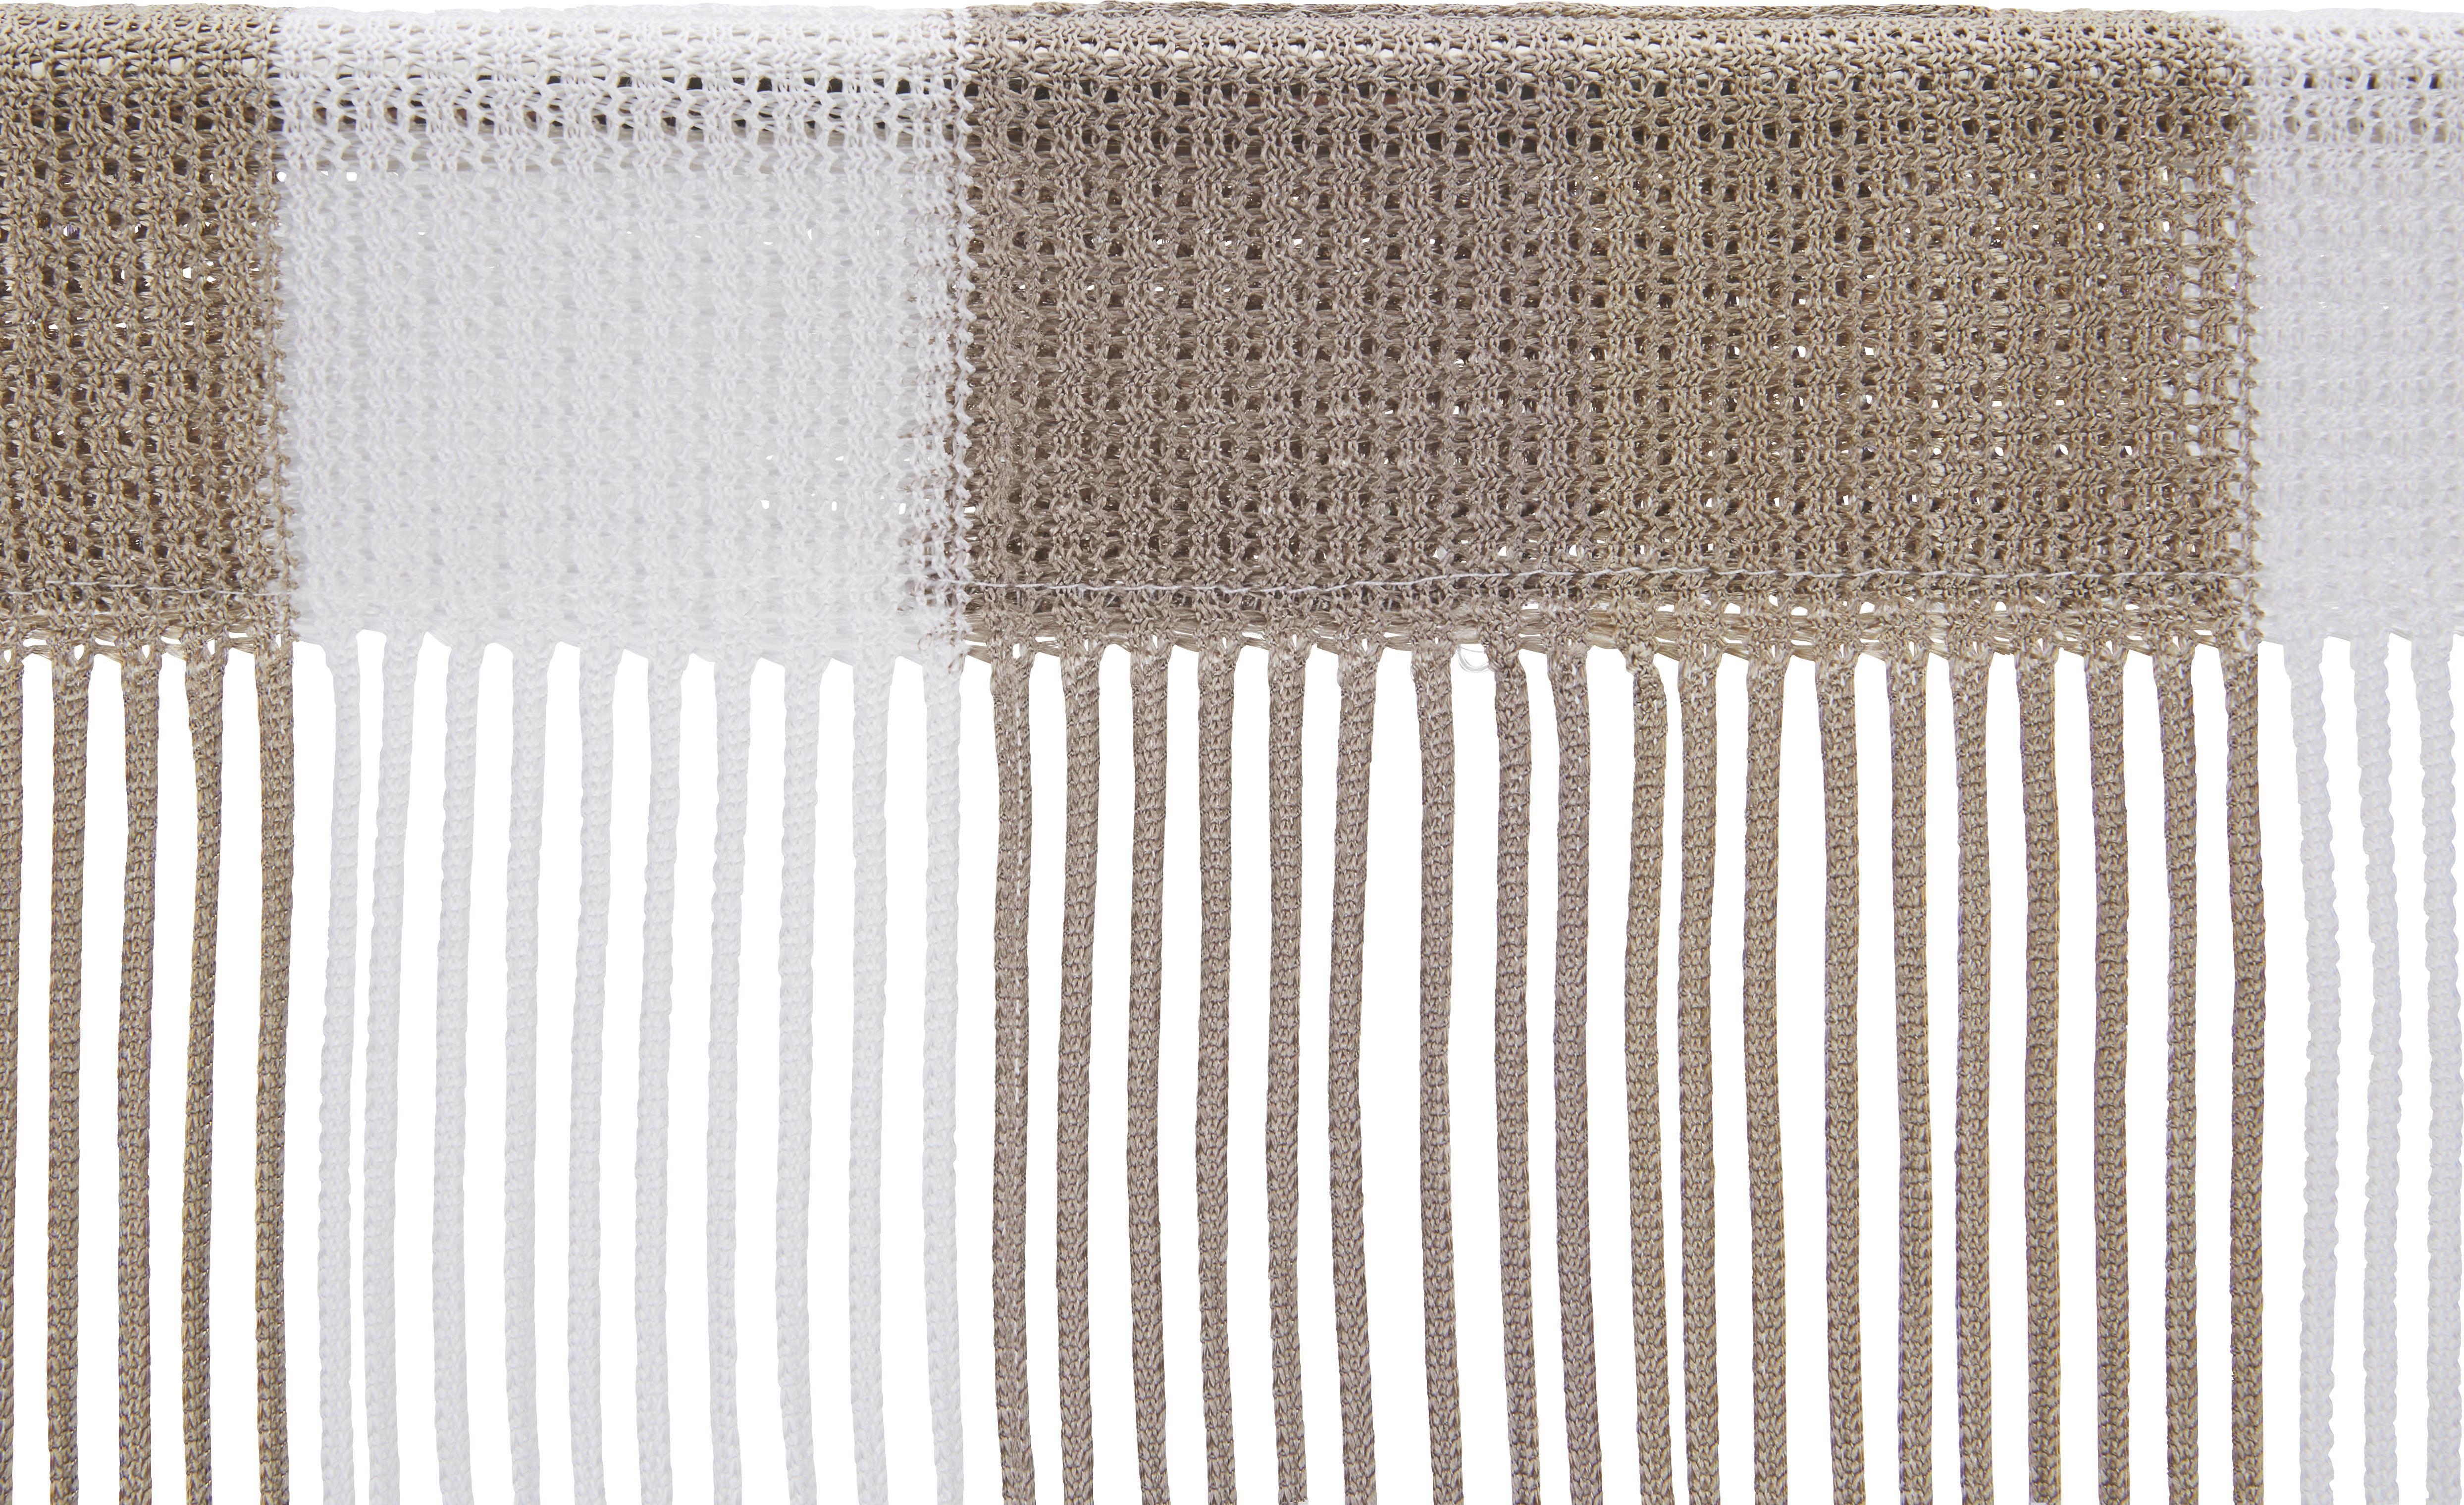 Zsinórfüggöny String - barna/fehér, textil (90/245cm) - premium living